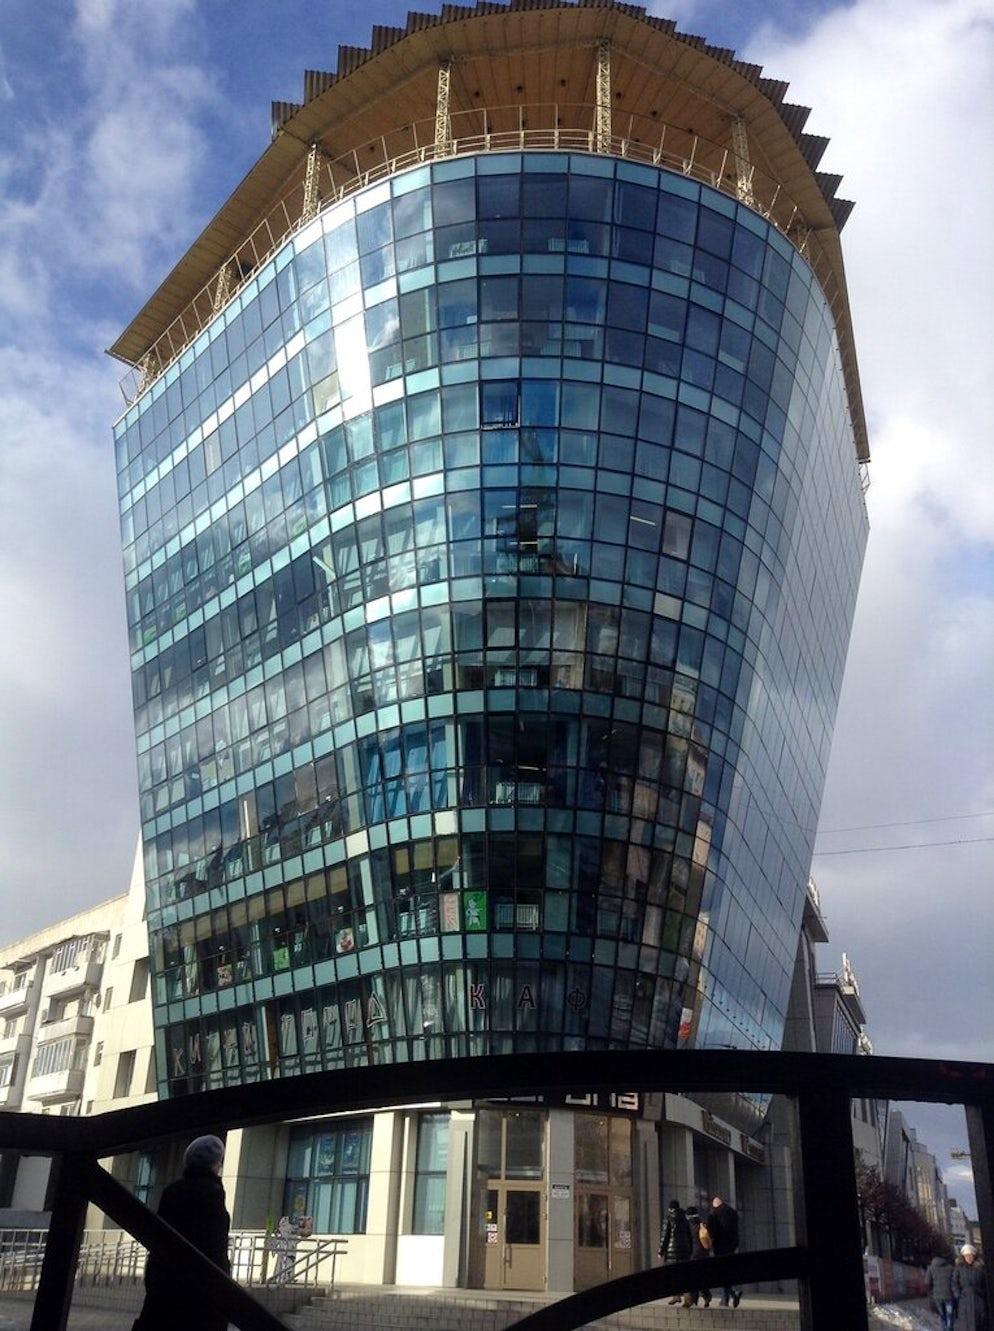 Photo © credits to skyscrapercity.com/Agata_irk